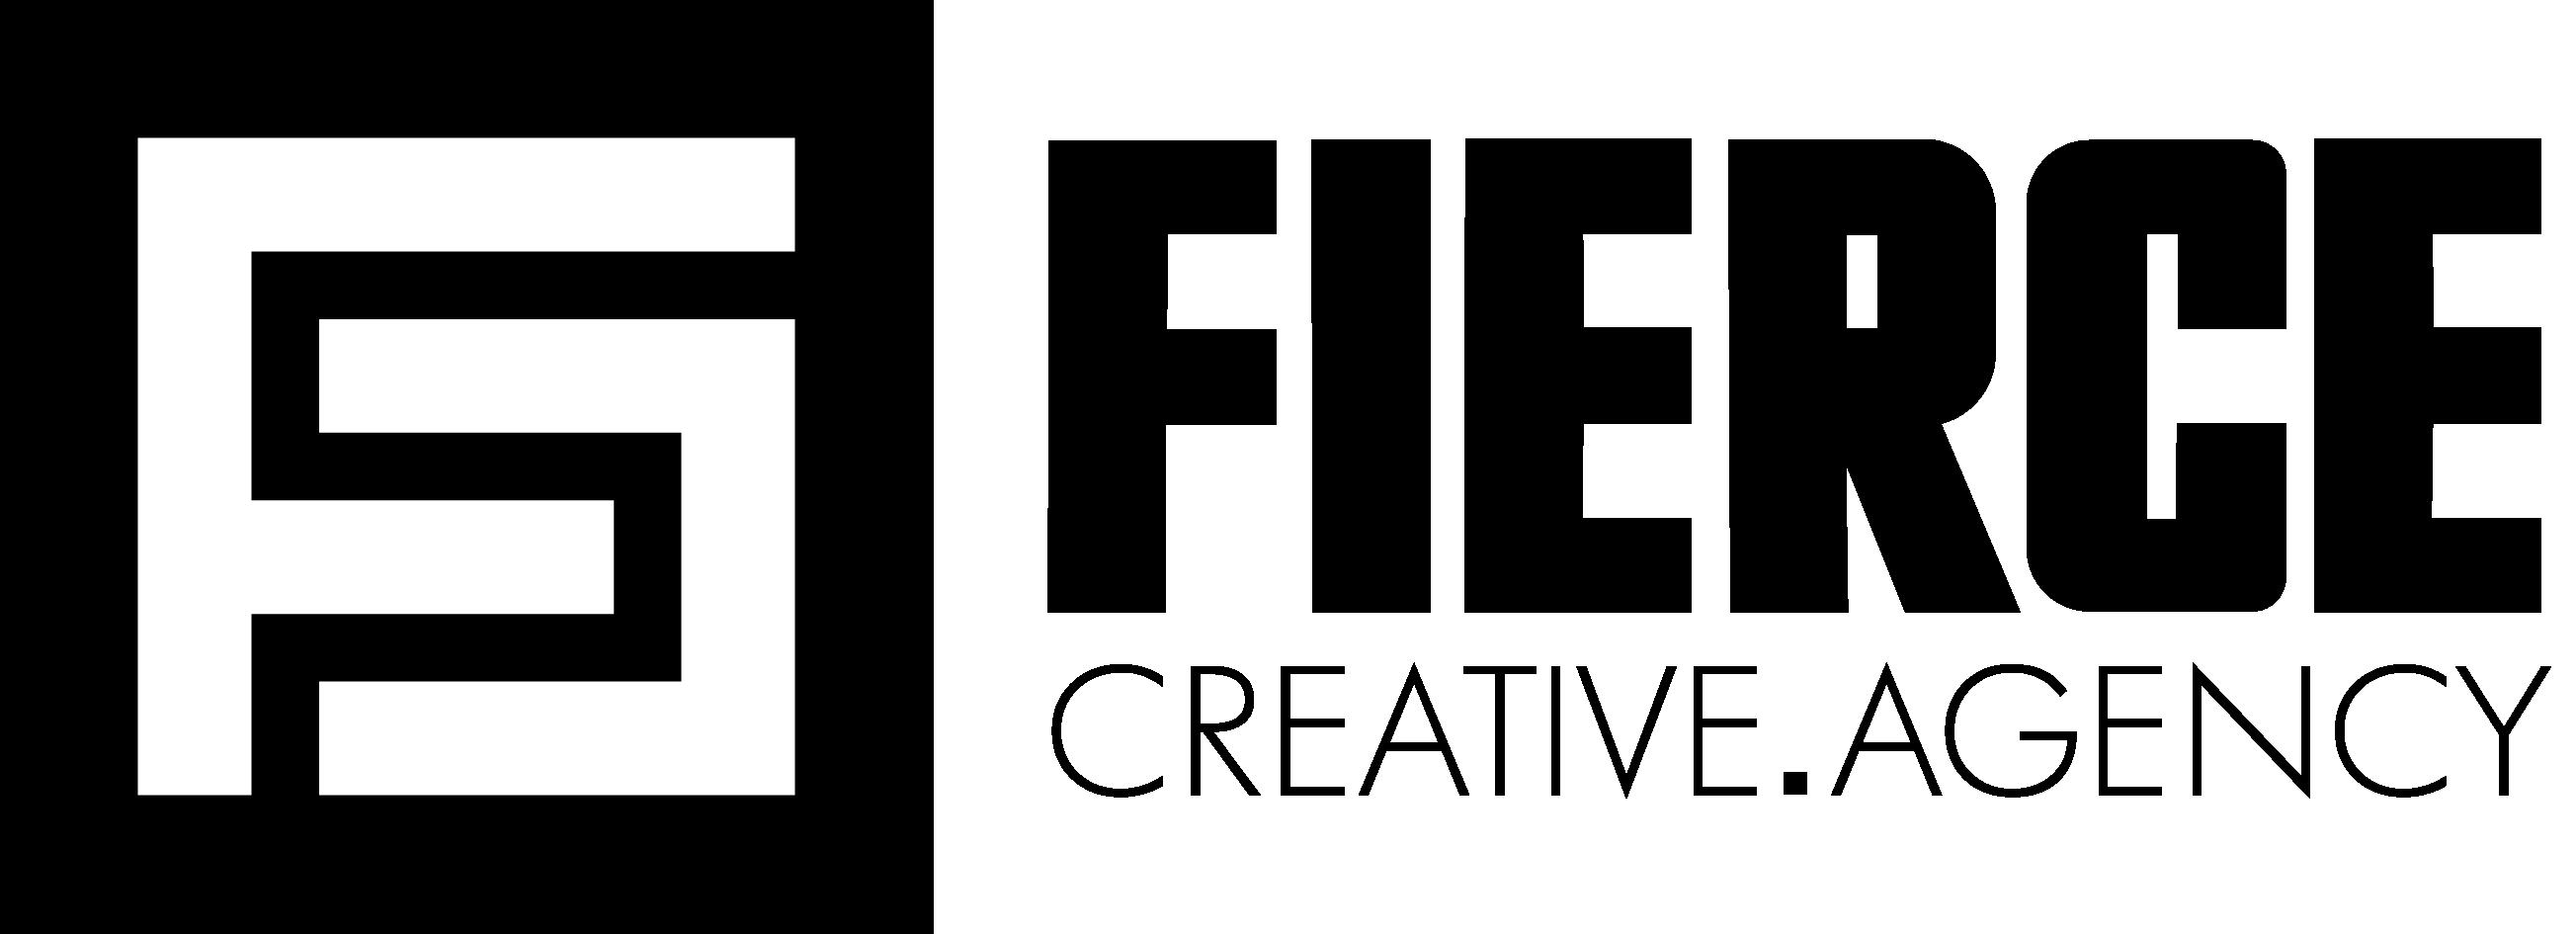 FierceCreative-Logo-Black